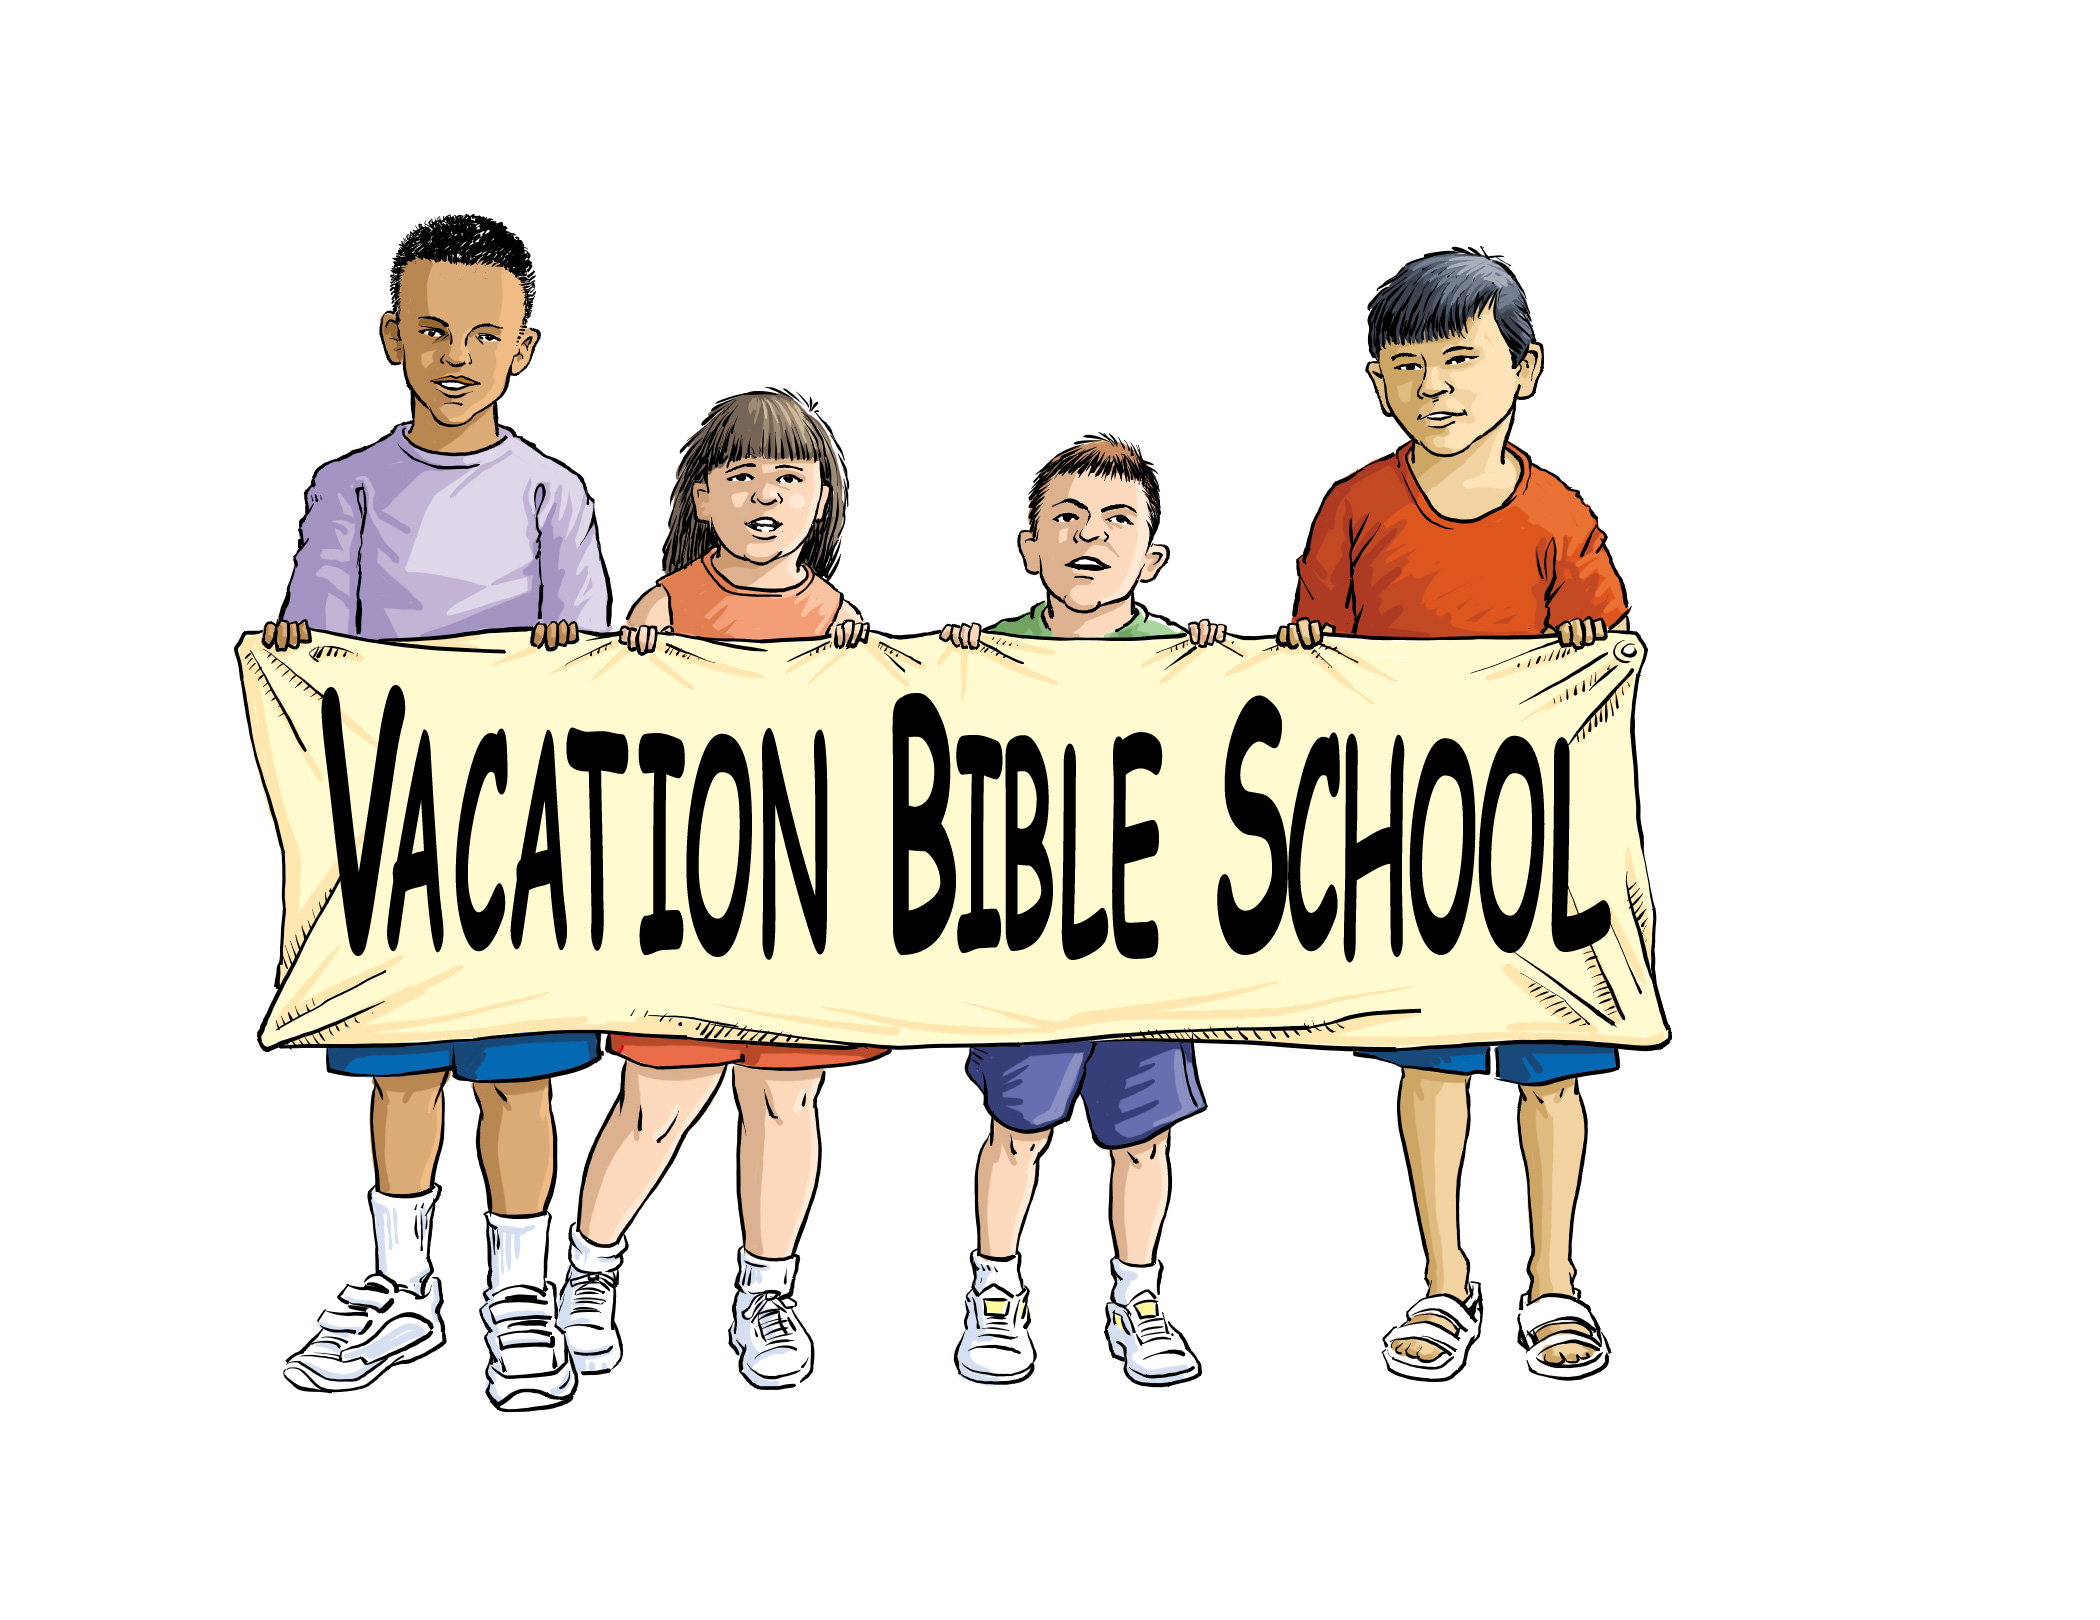 vacation_bible_school.jpg